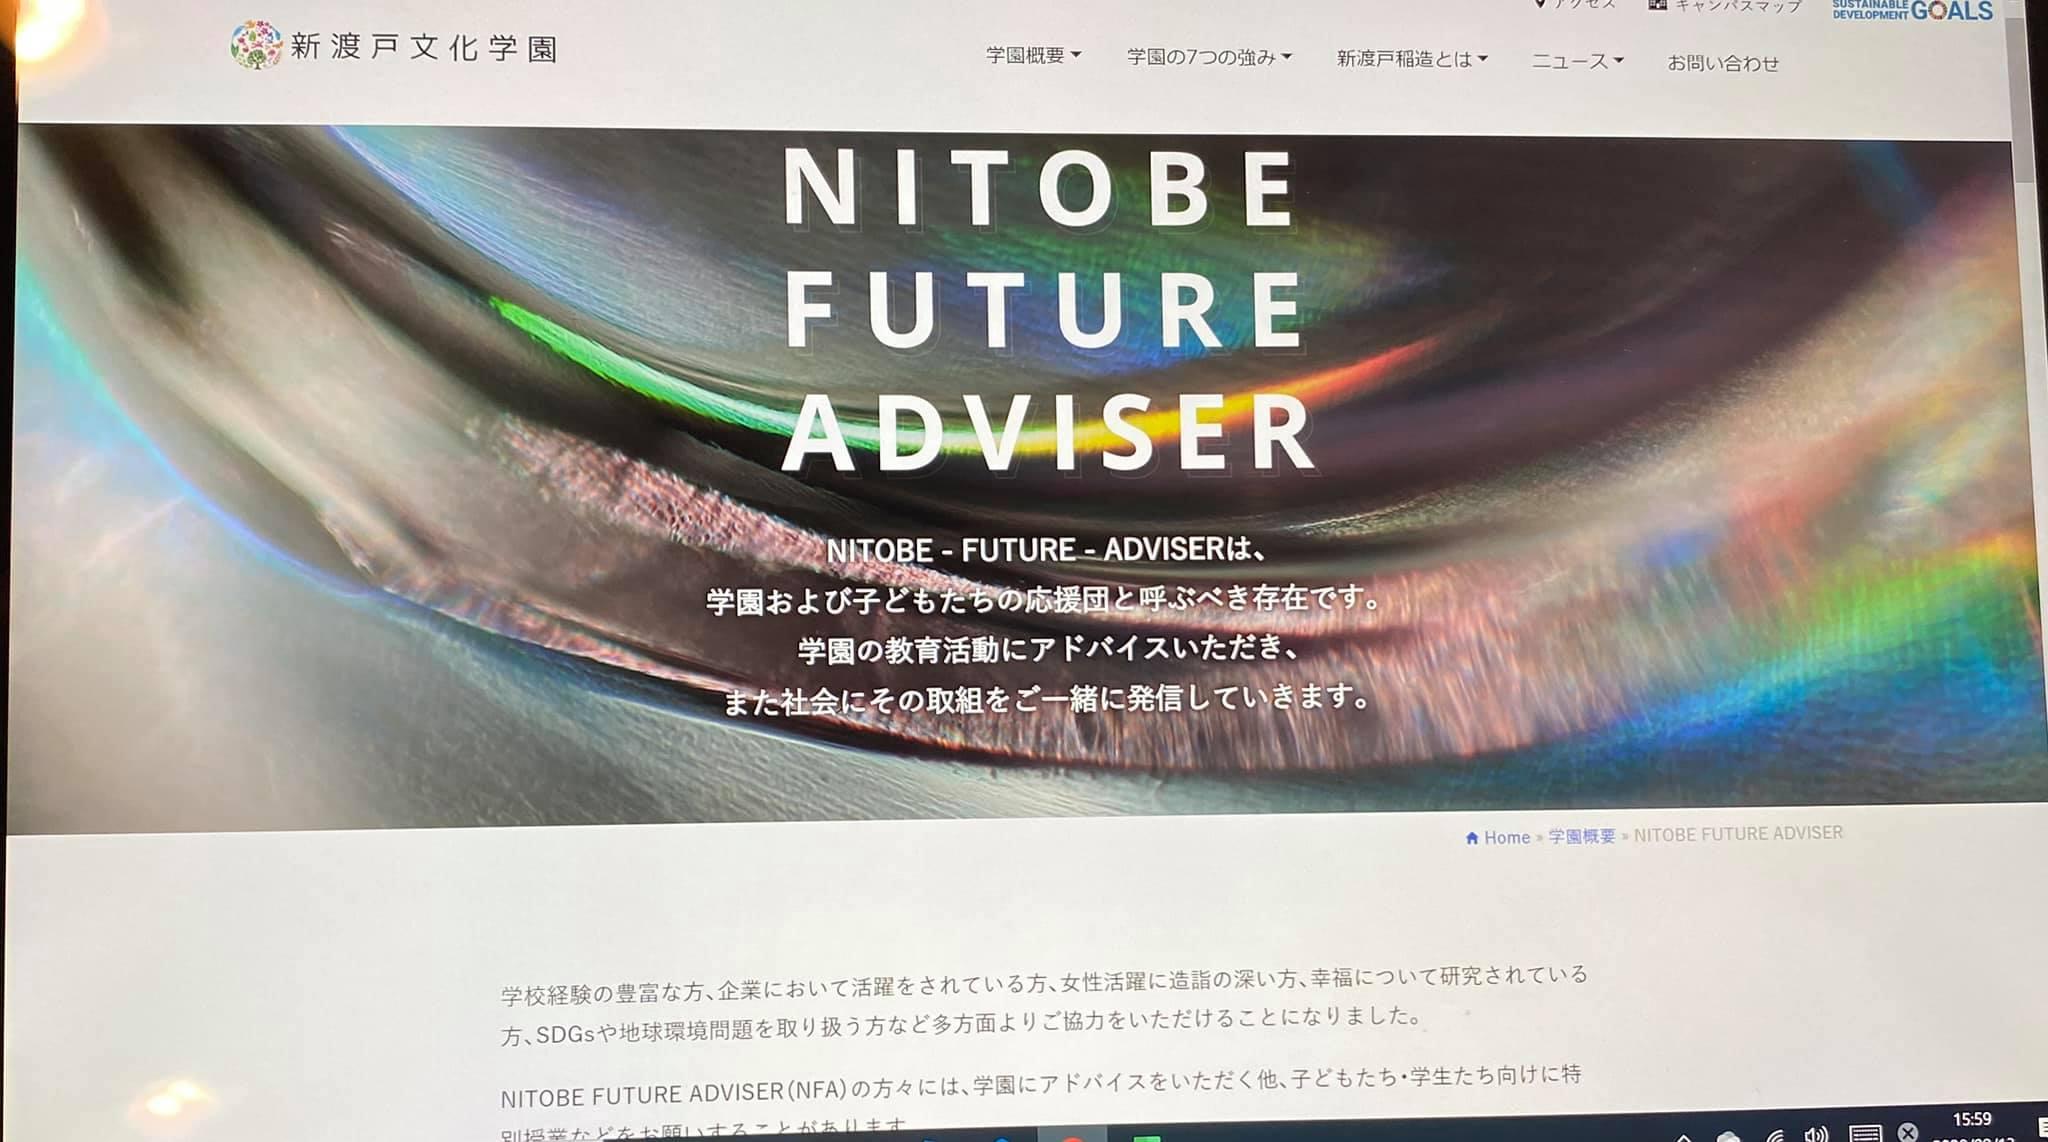 """FUTURE ADVISER 素晴らしいミッションとの出逢い"